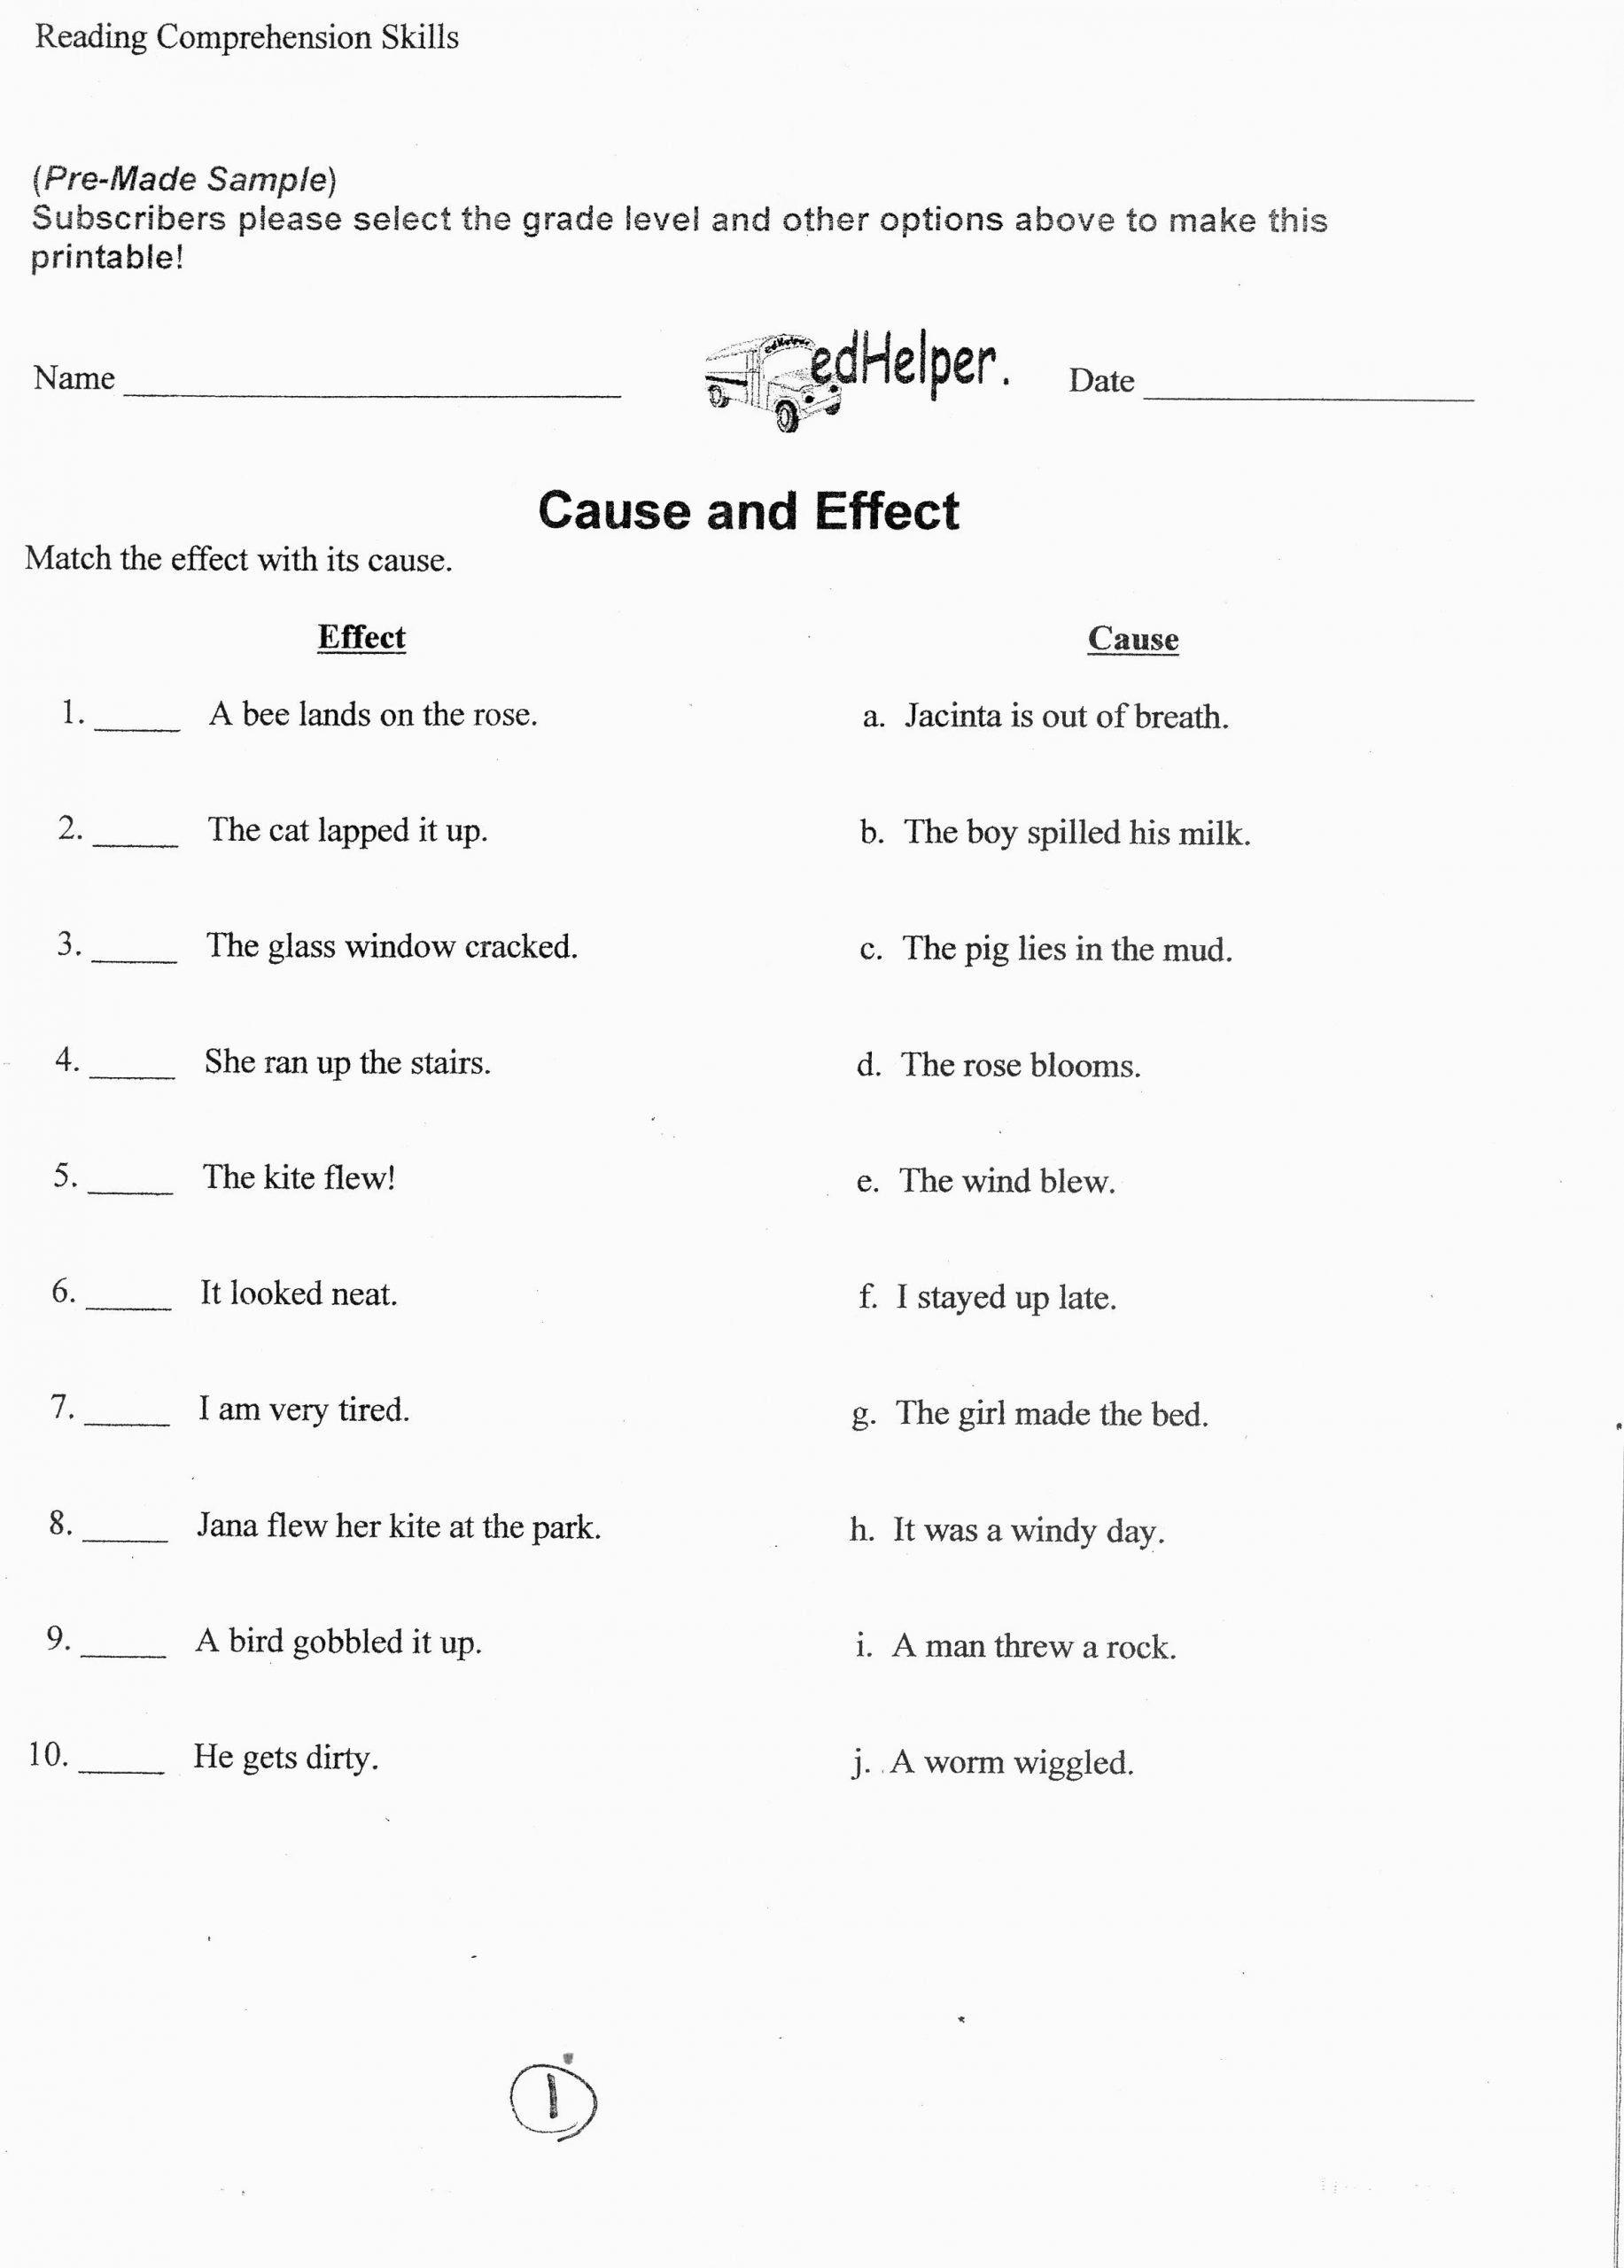 9th Grade Vocabulary Worksheet Language Arts Worksheet Cause And Effect In 2020 Language Arts Worksheets 6th Grade Writing Writing Worksheets